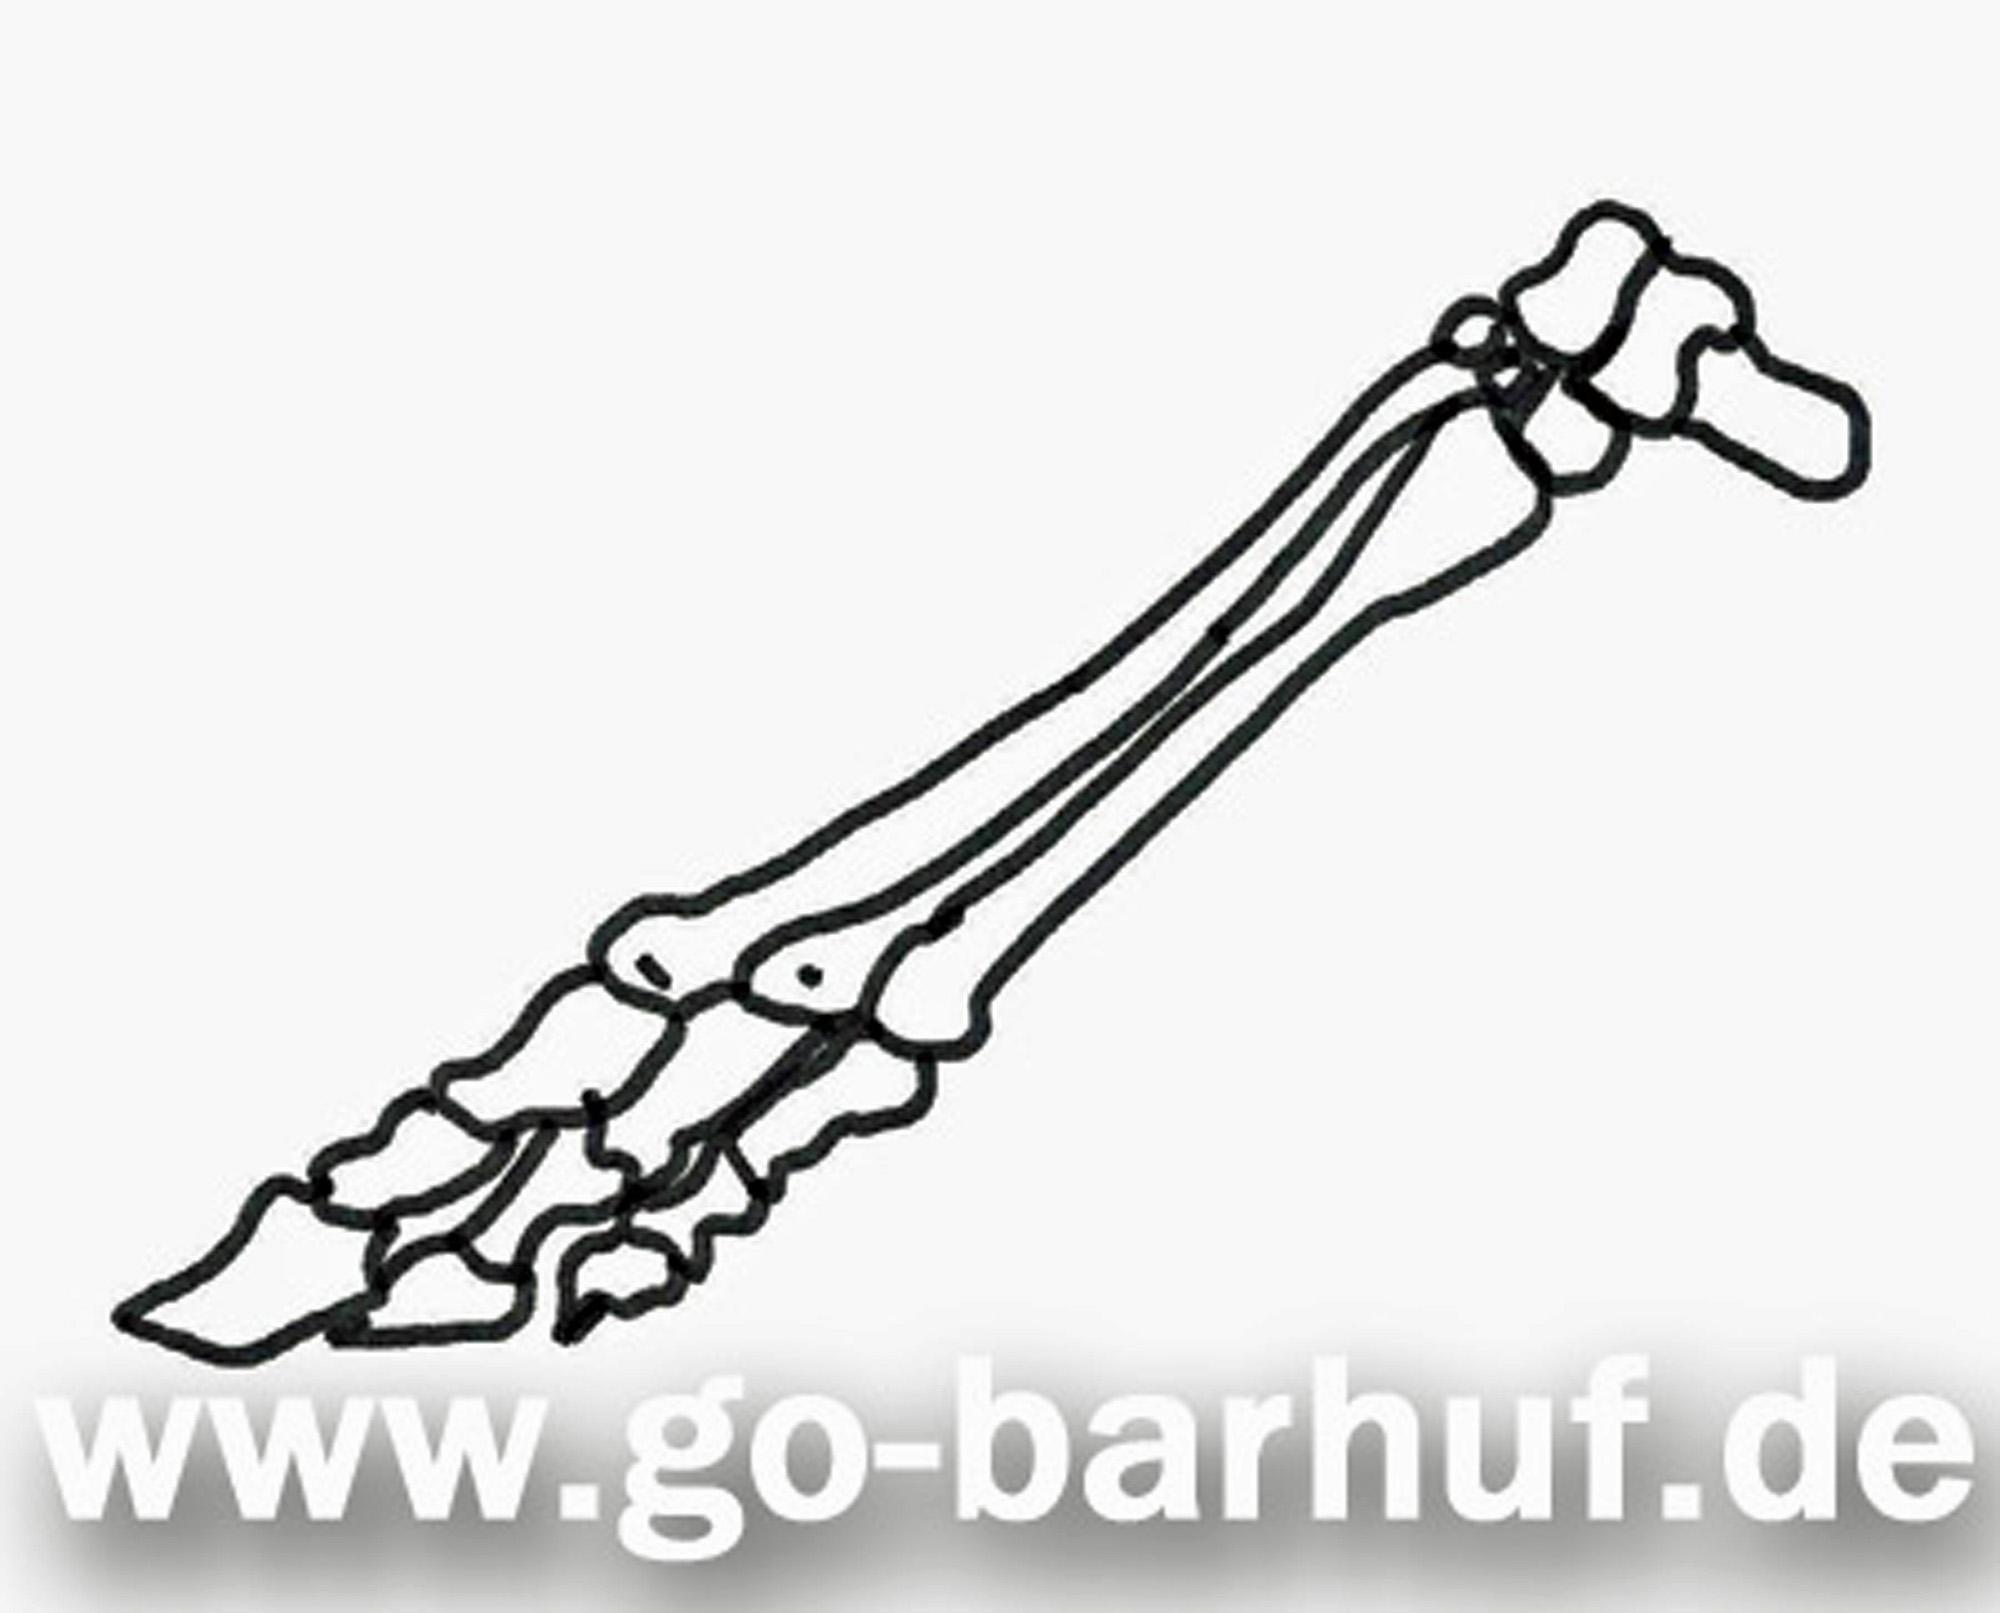 Manu Volk Go-barhuf.de - Anatomie der Gliedmaße